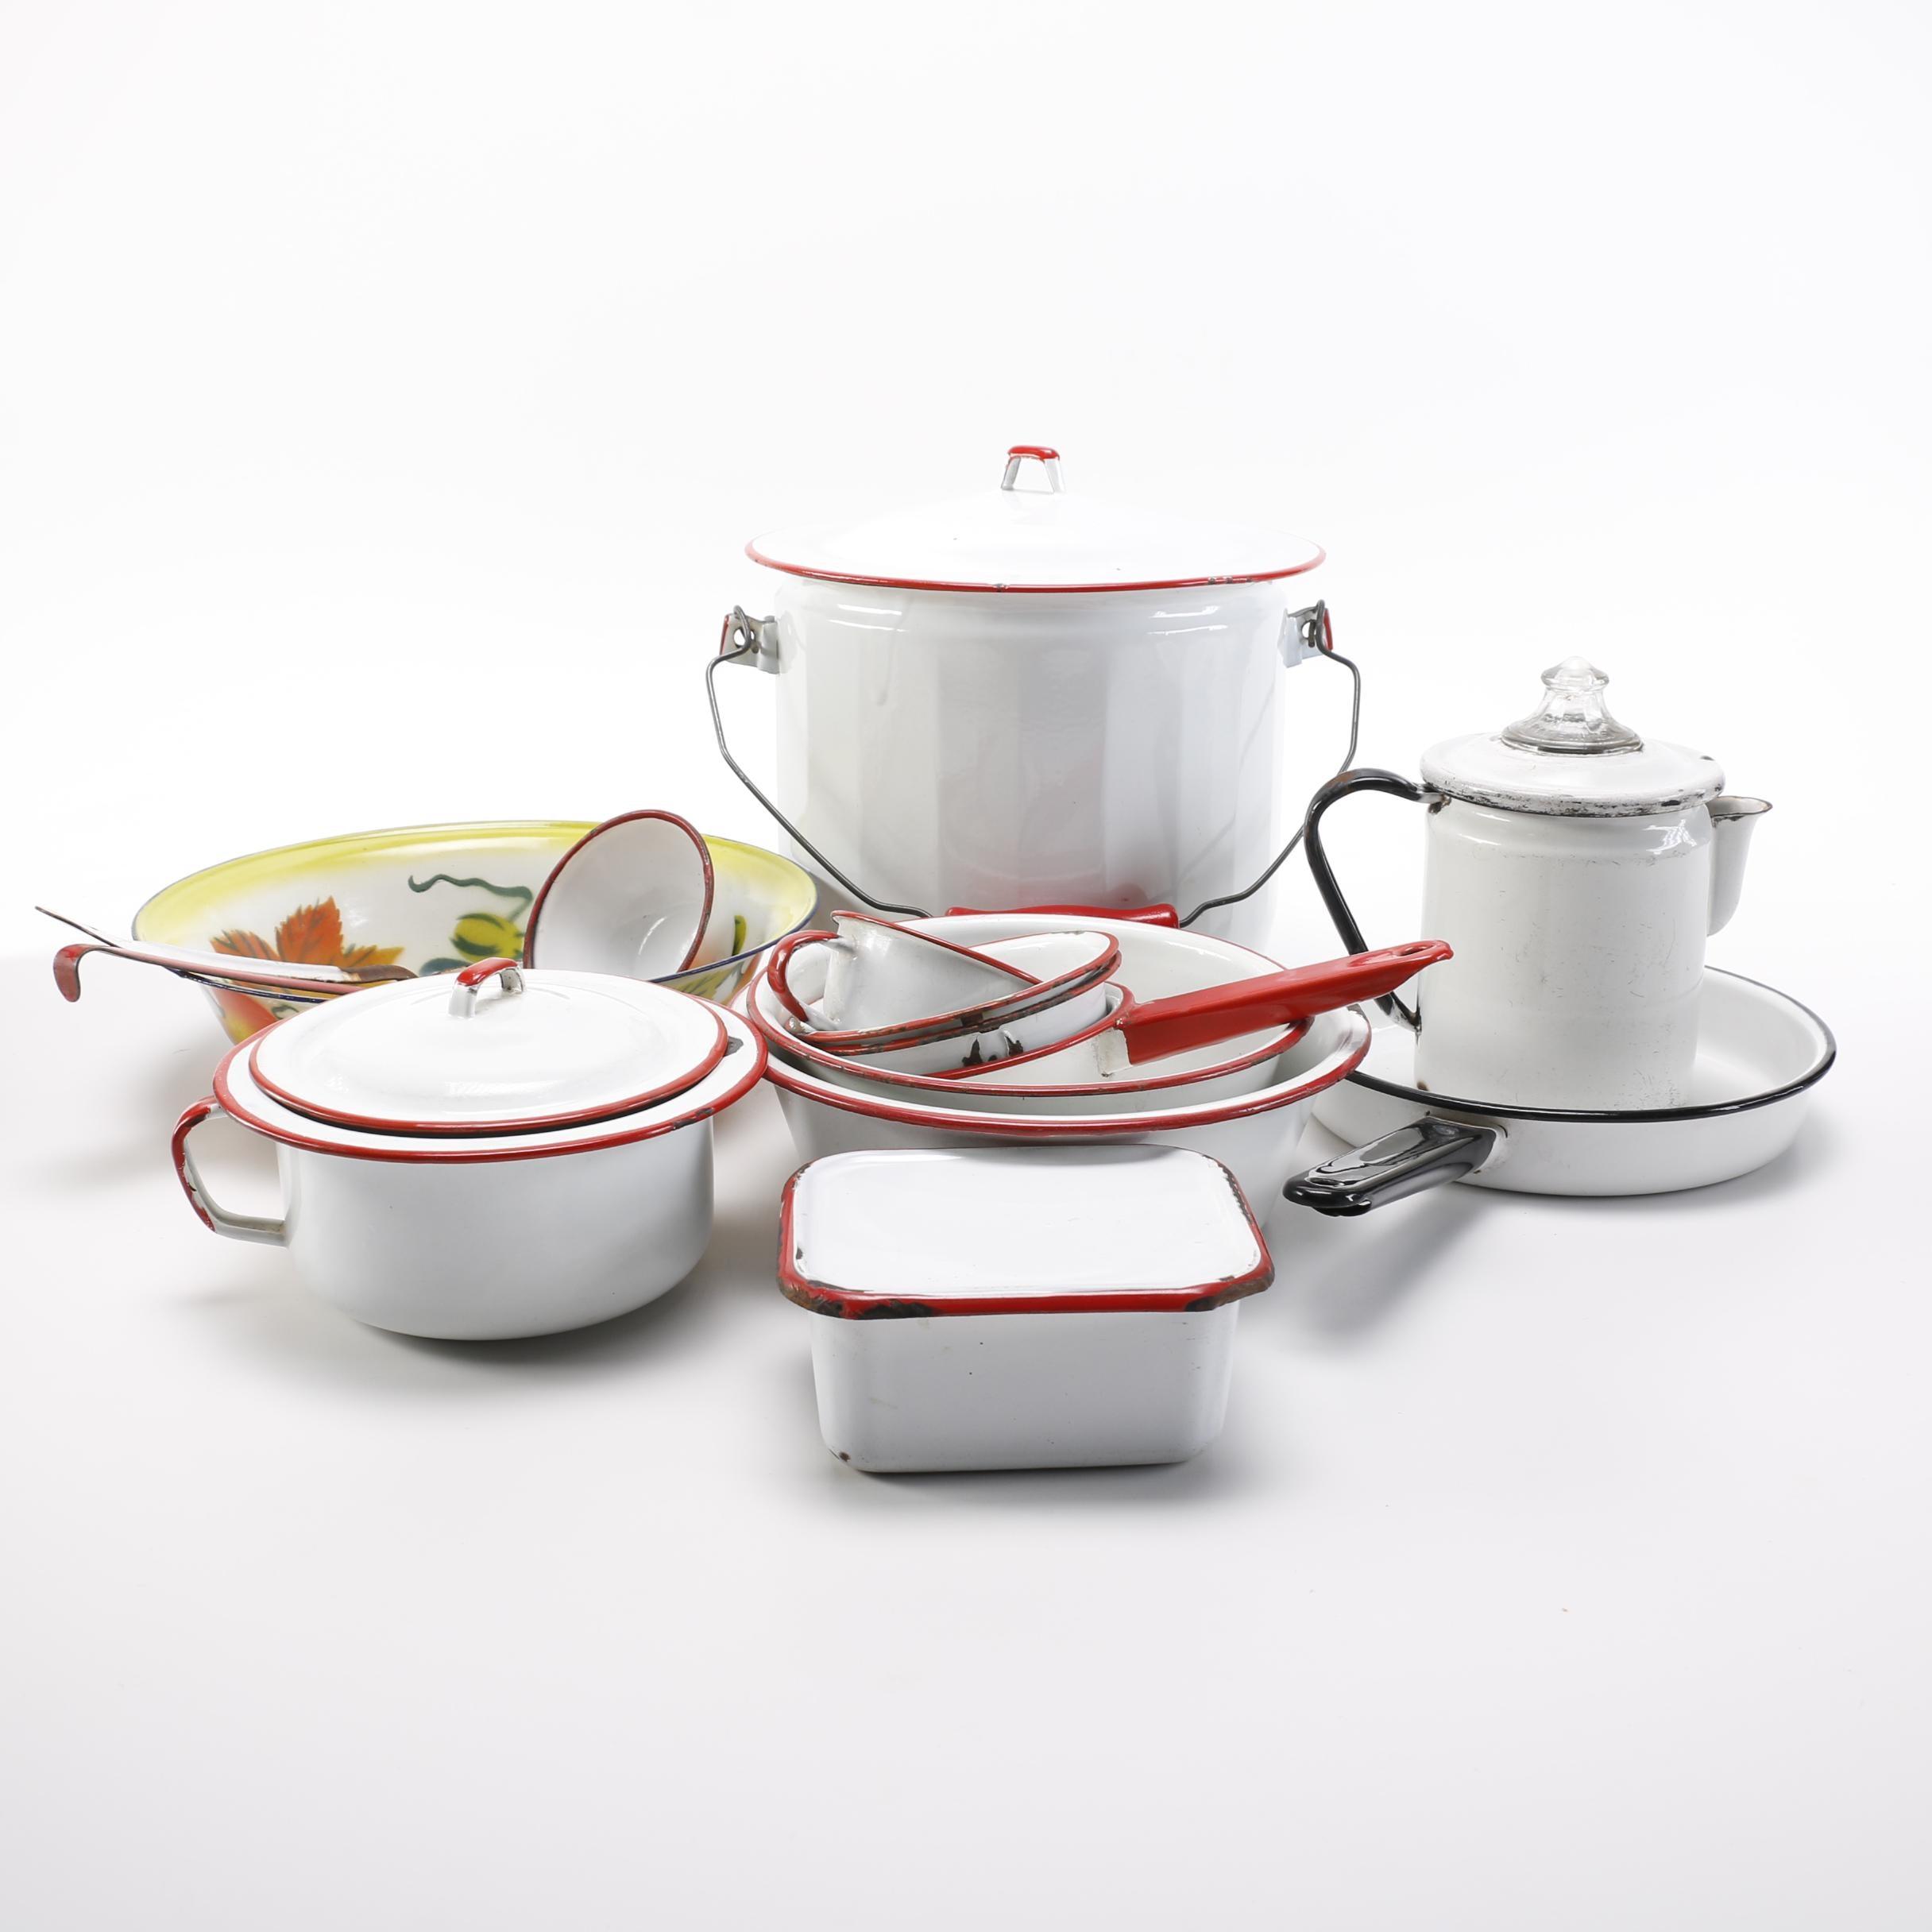 Vintage Enameled Kitchenware